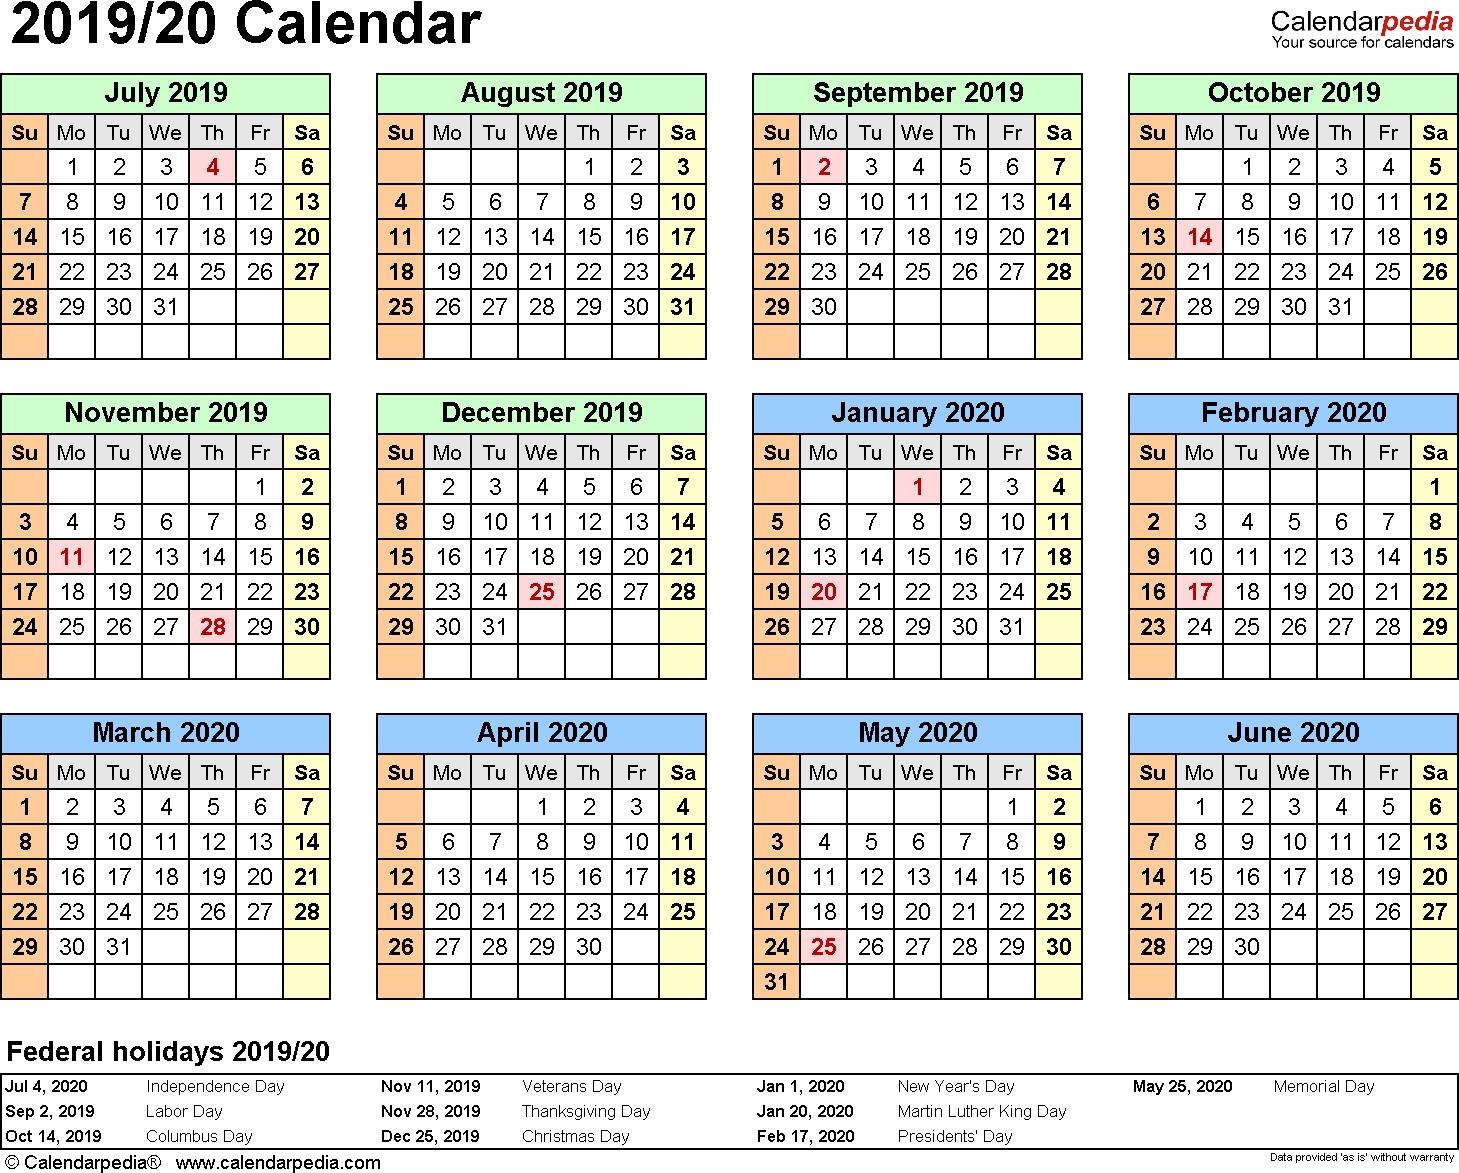 Printable Calendar July 2019 To June 2020 - Calendar Inspiration Design regarding June 2019-June 2020 Yearly Calendar